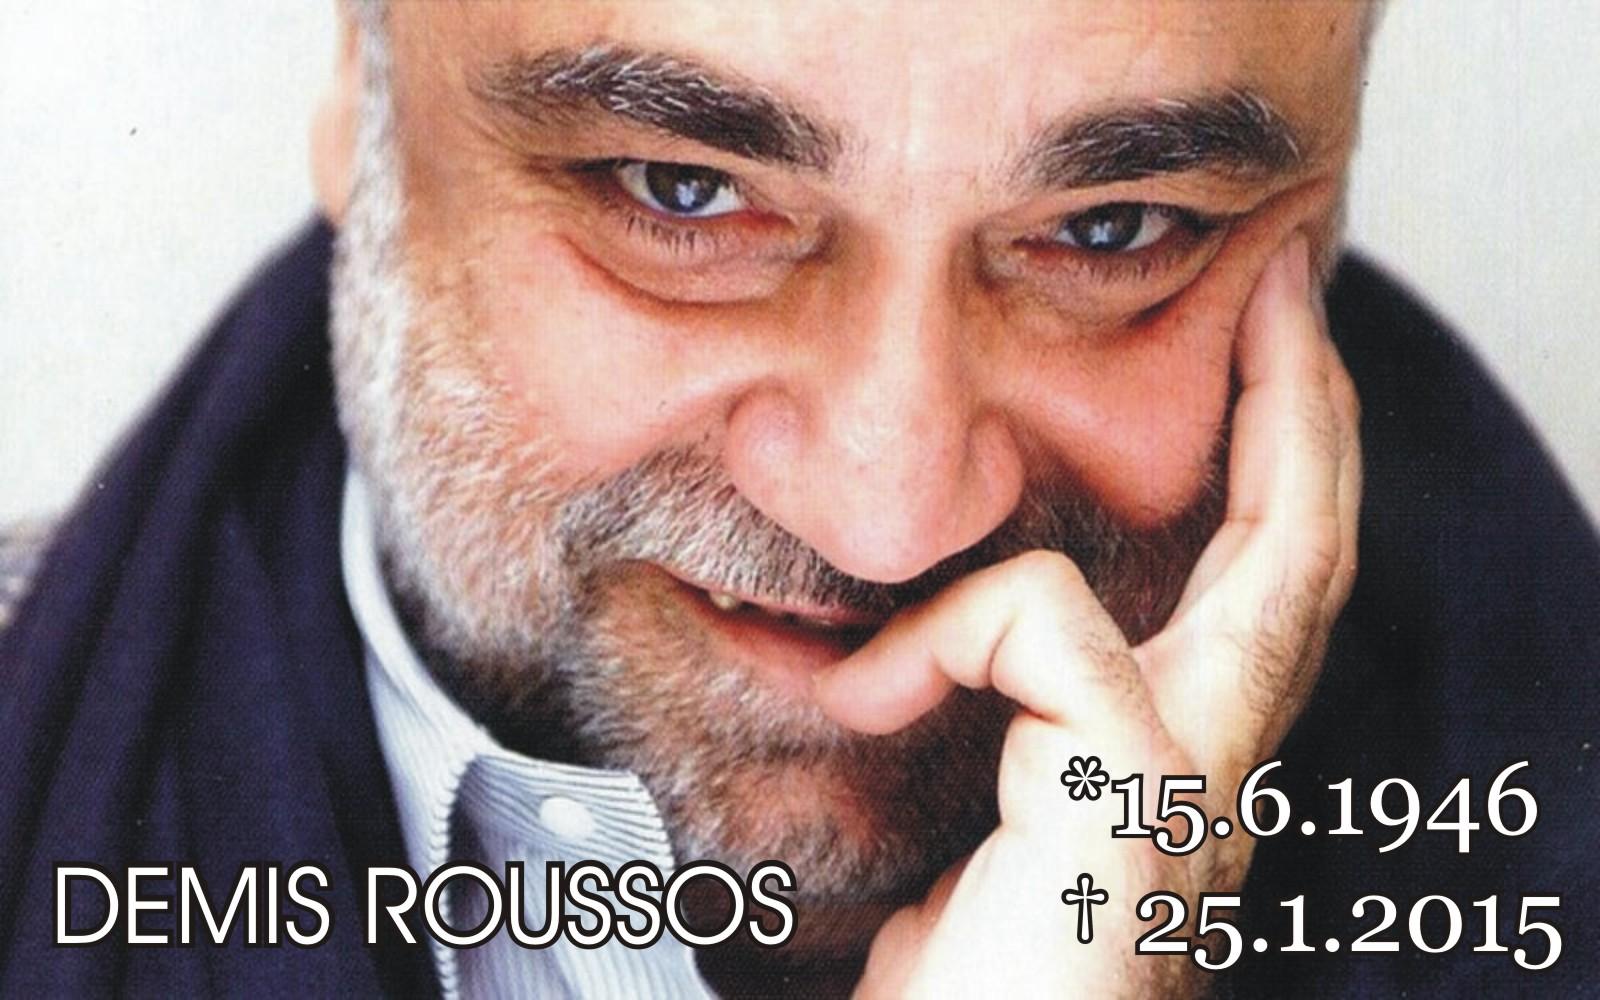 Zomrel Demis Roussos